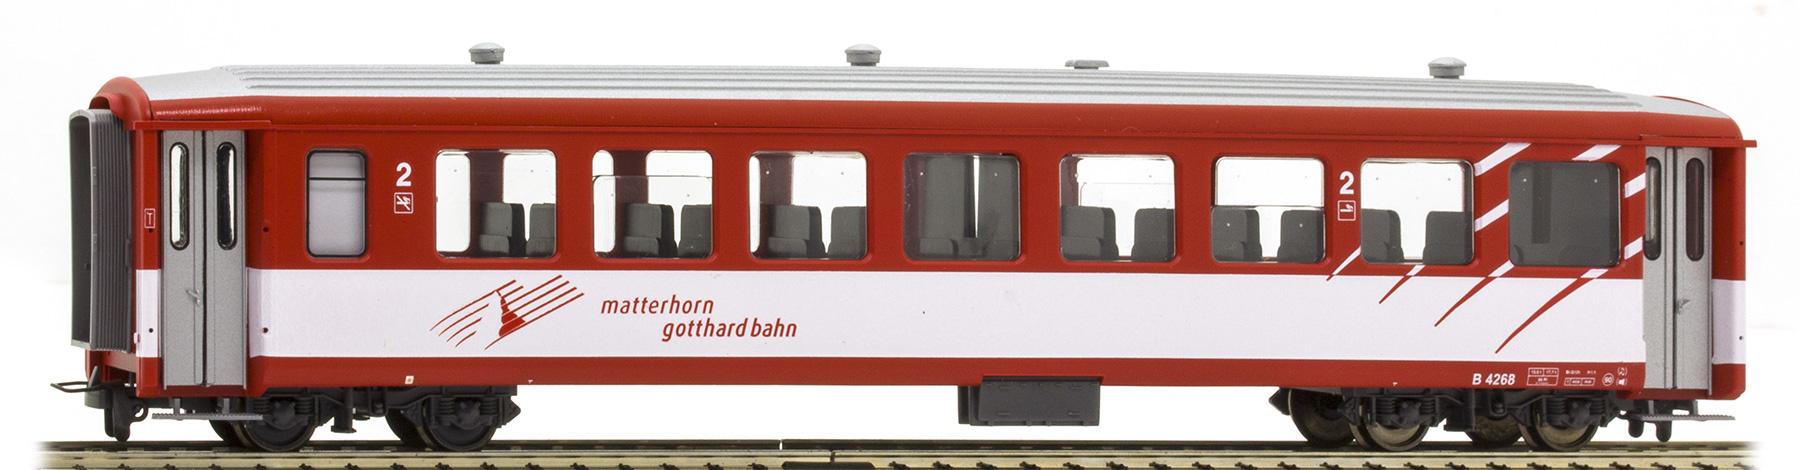 3266258 MGB B 4268 Personenwagen-1